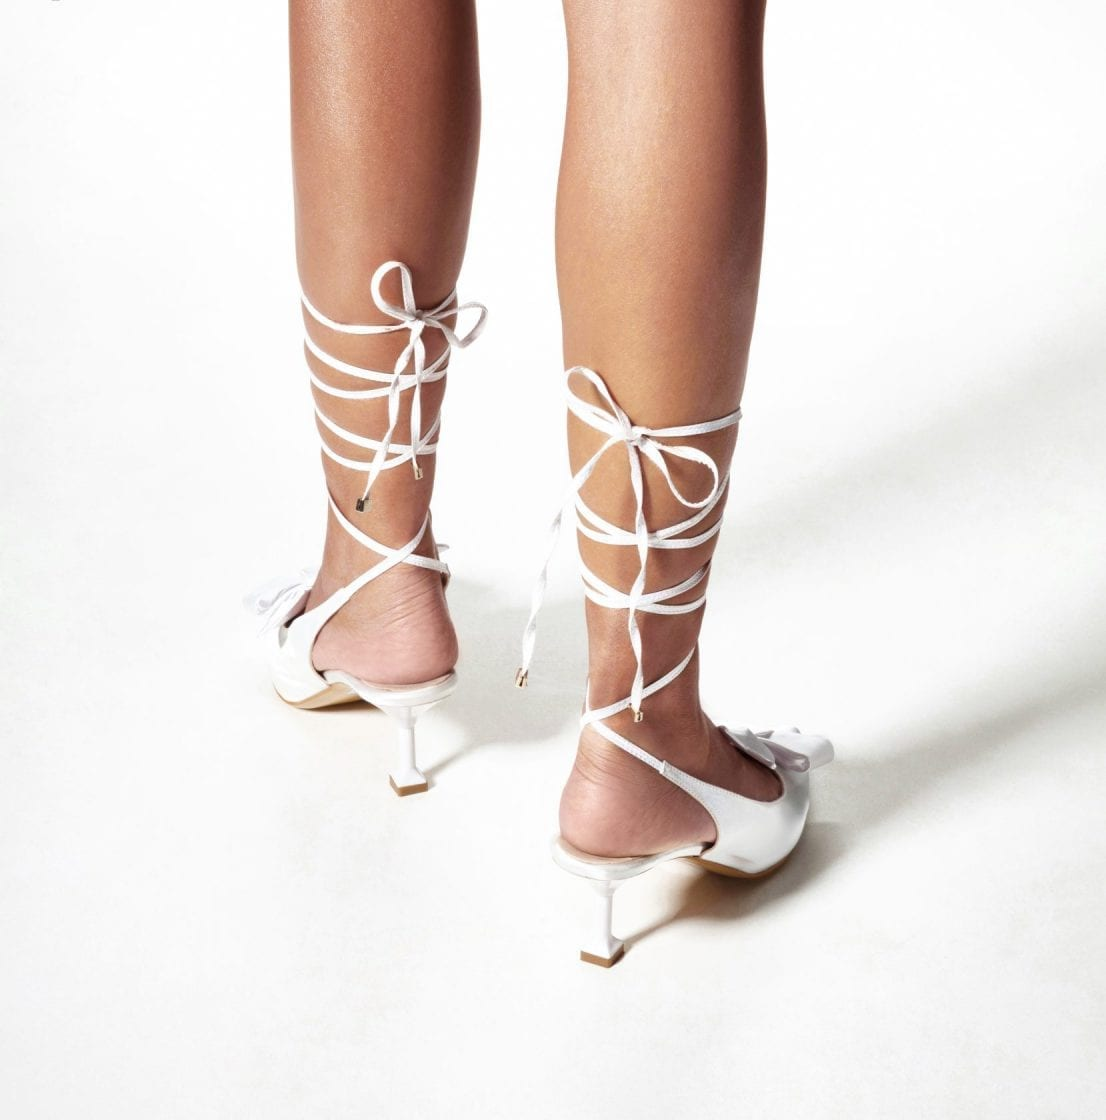 LEGS 9